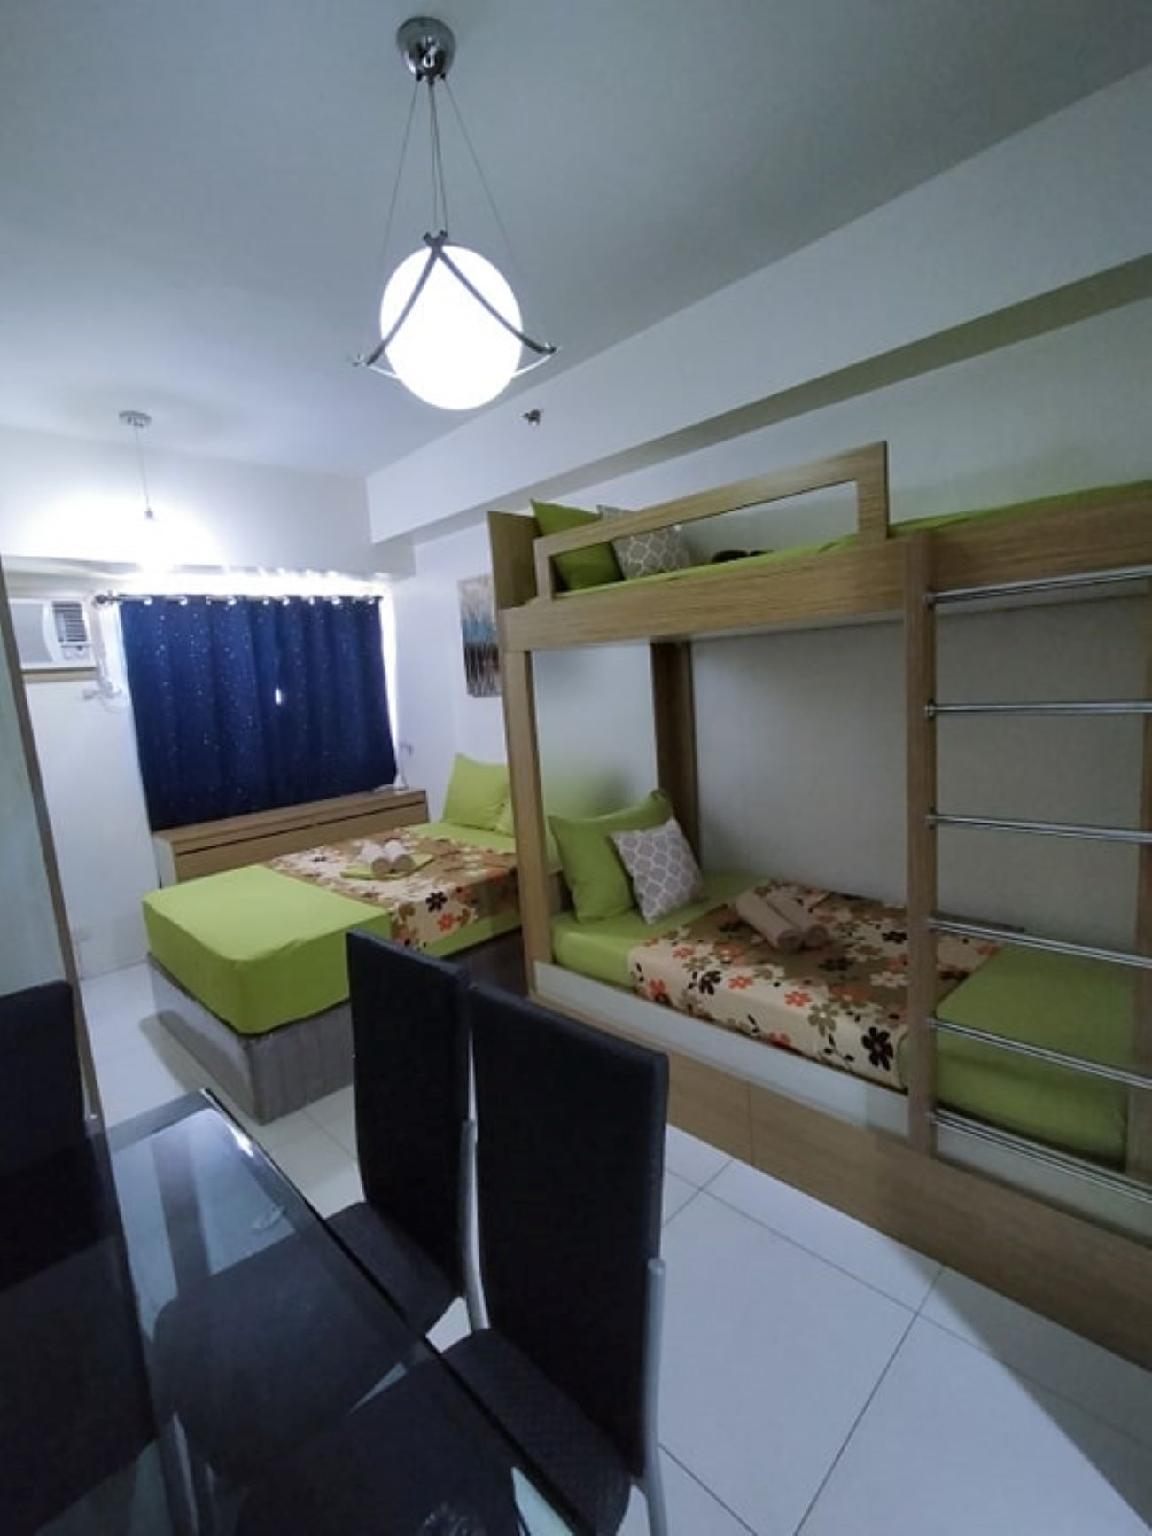 Green 1 Bedroom Condo in Metro Manila W/Netflix